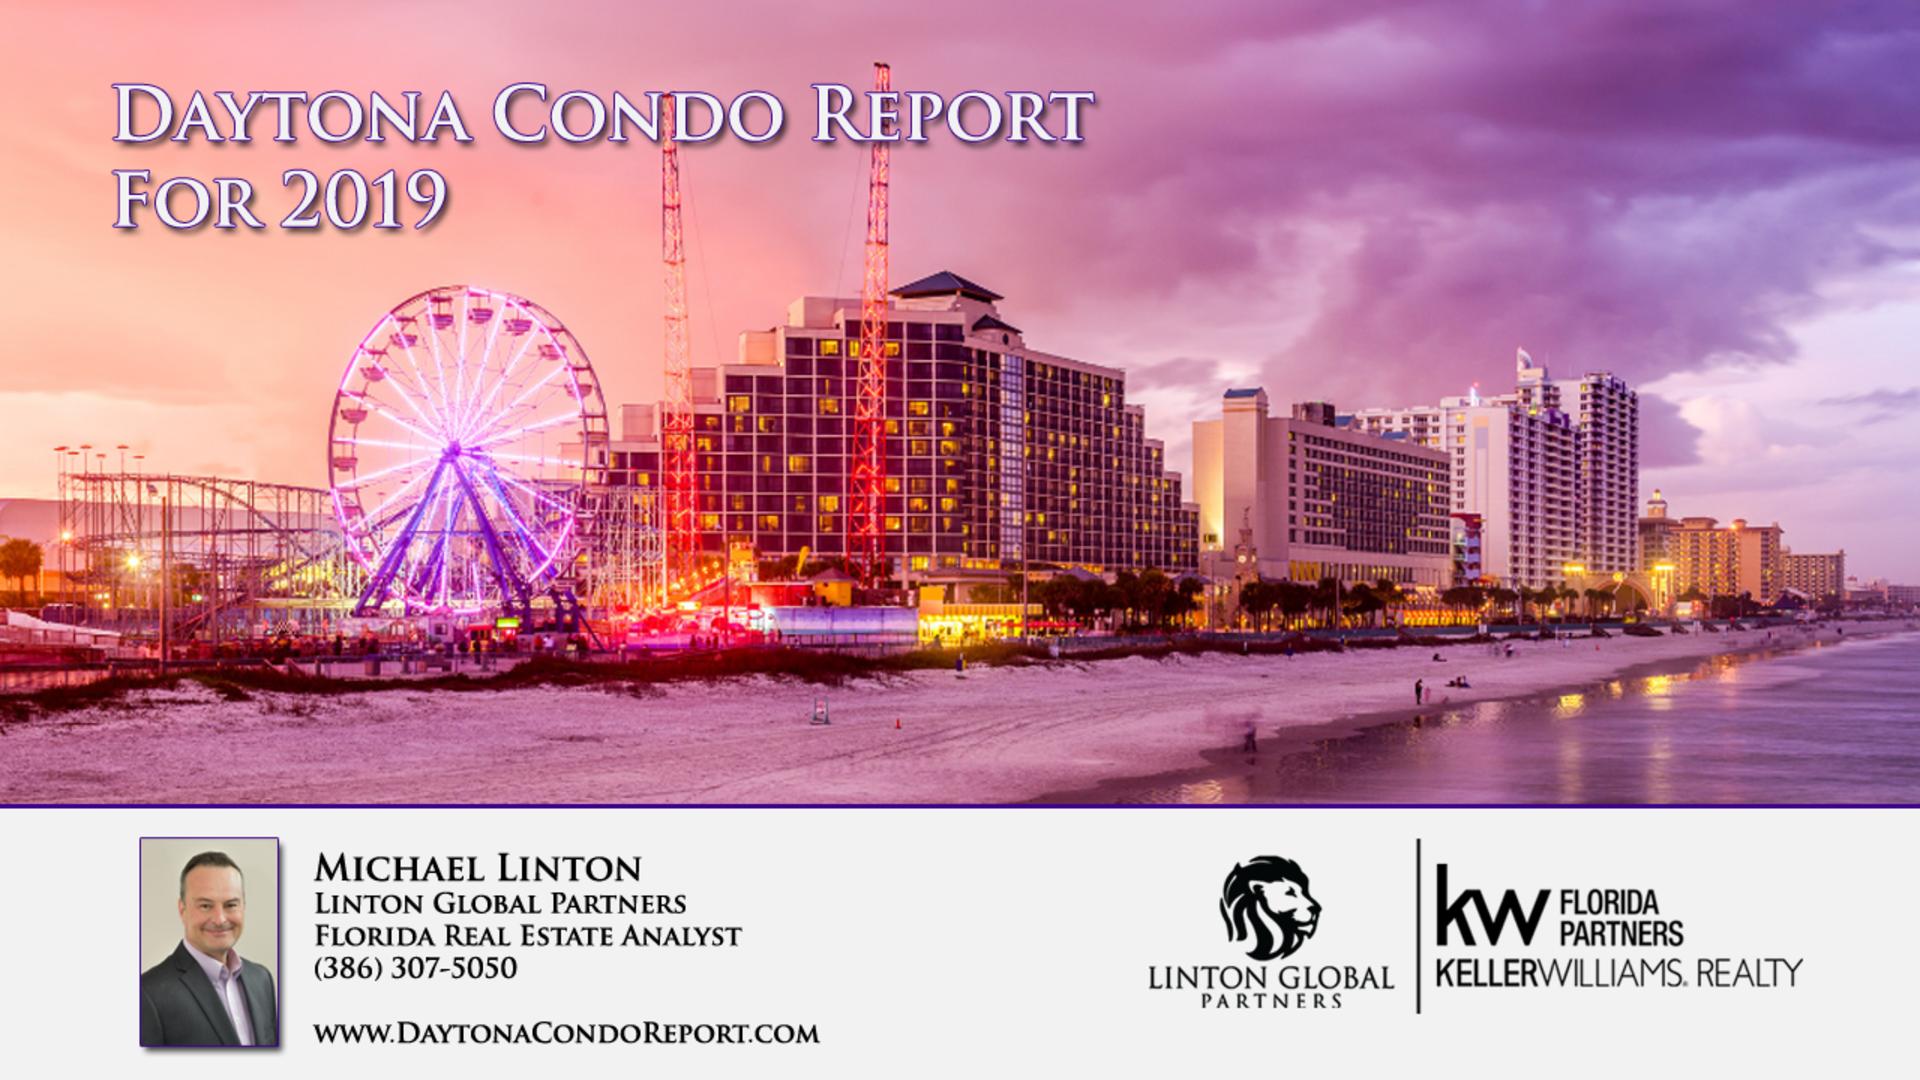 2019 Daytona Condo Report